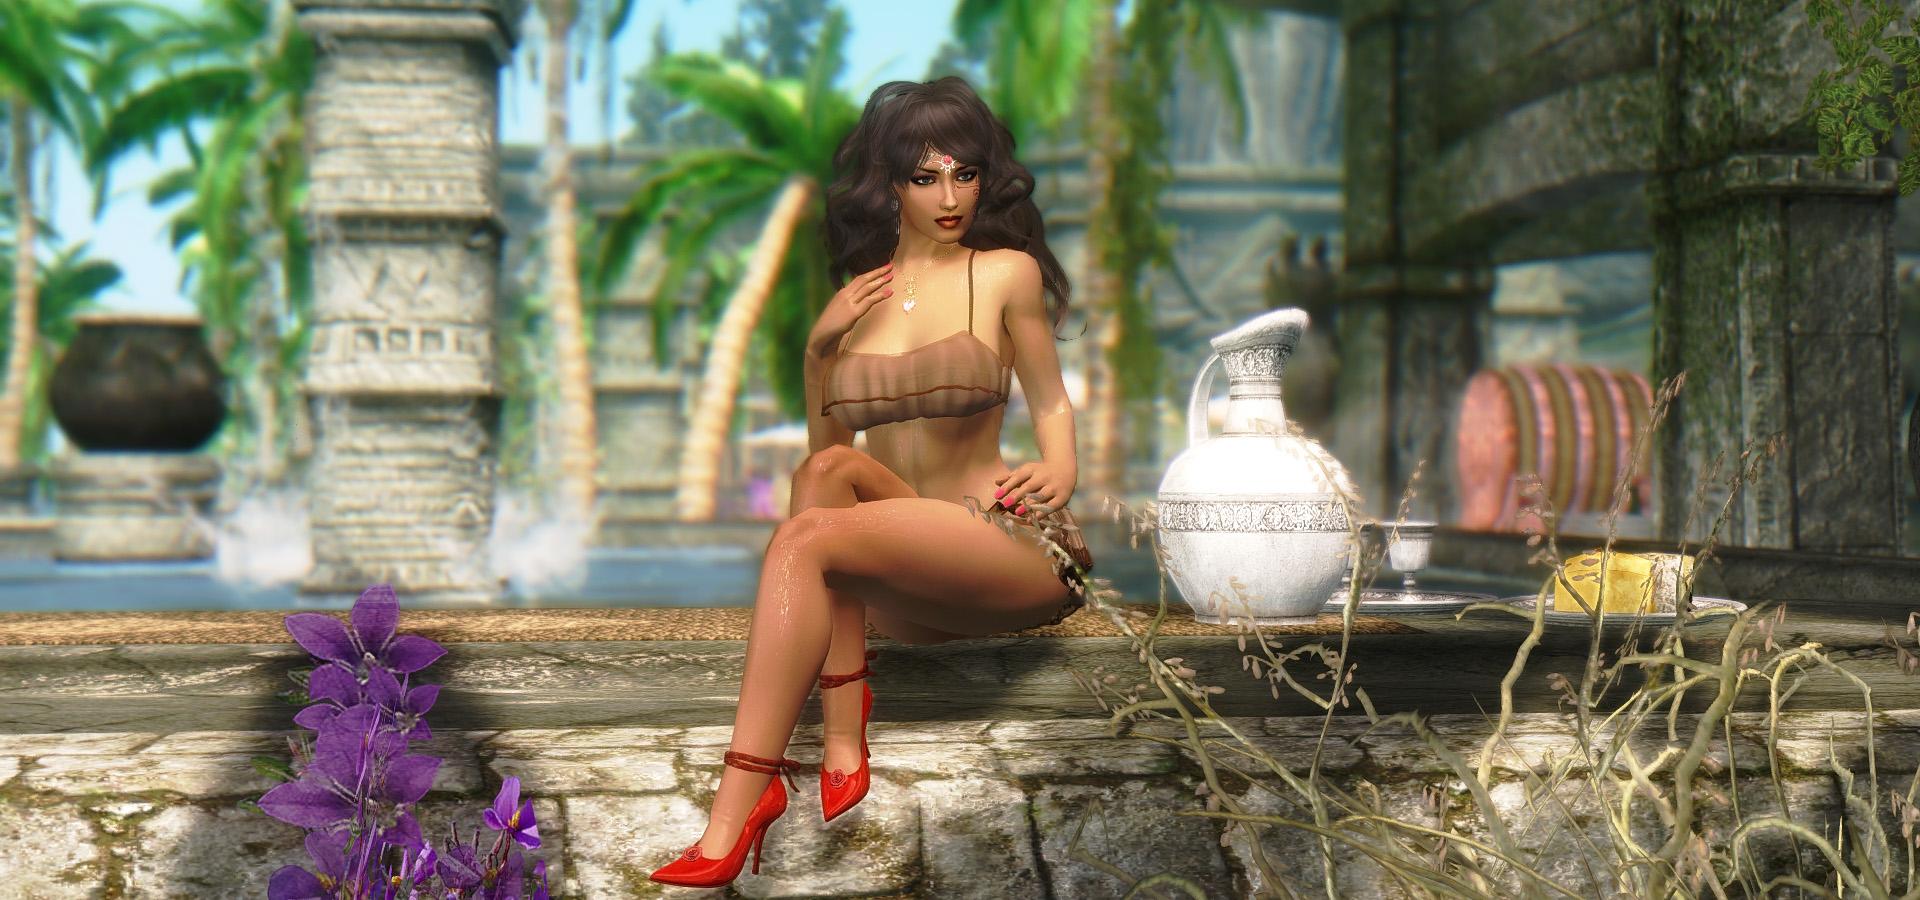 609. Около бассейна, GP.jpg - Elder Scrolls 5: Skyrim, the CBBE, Сборка-21